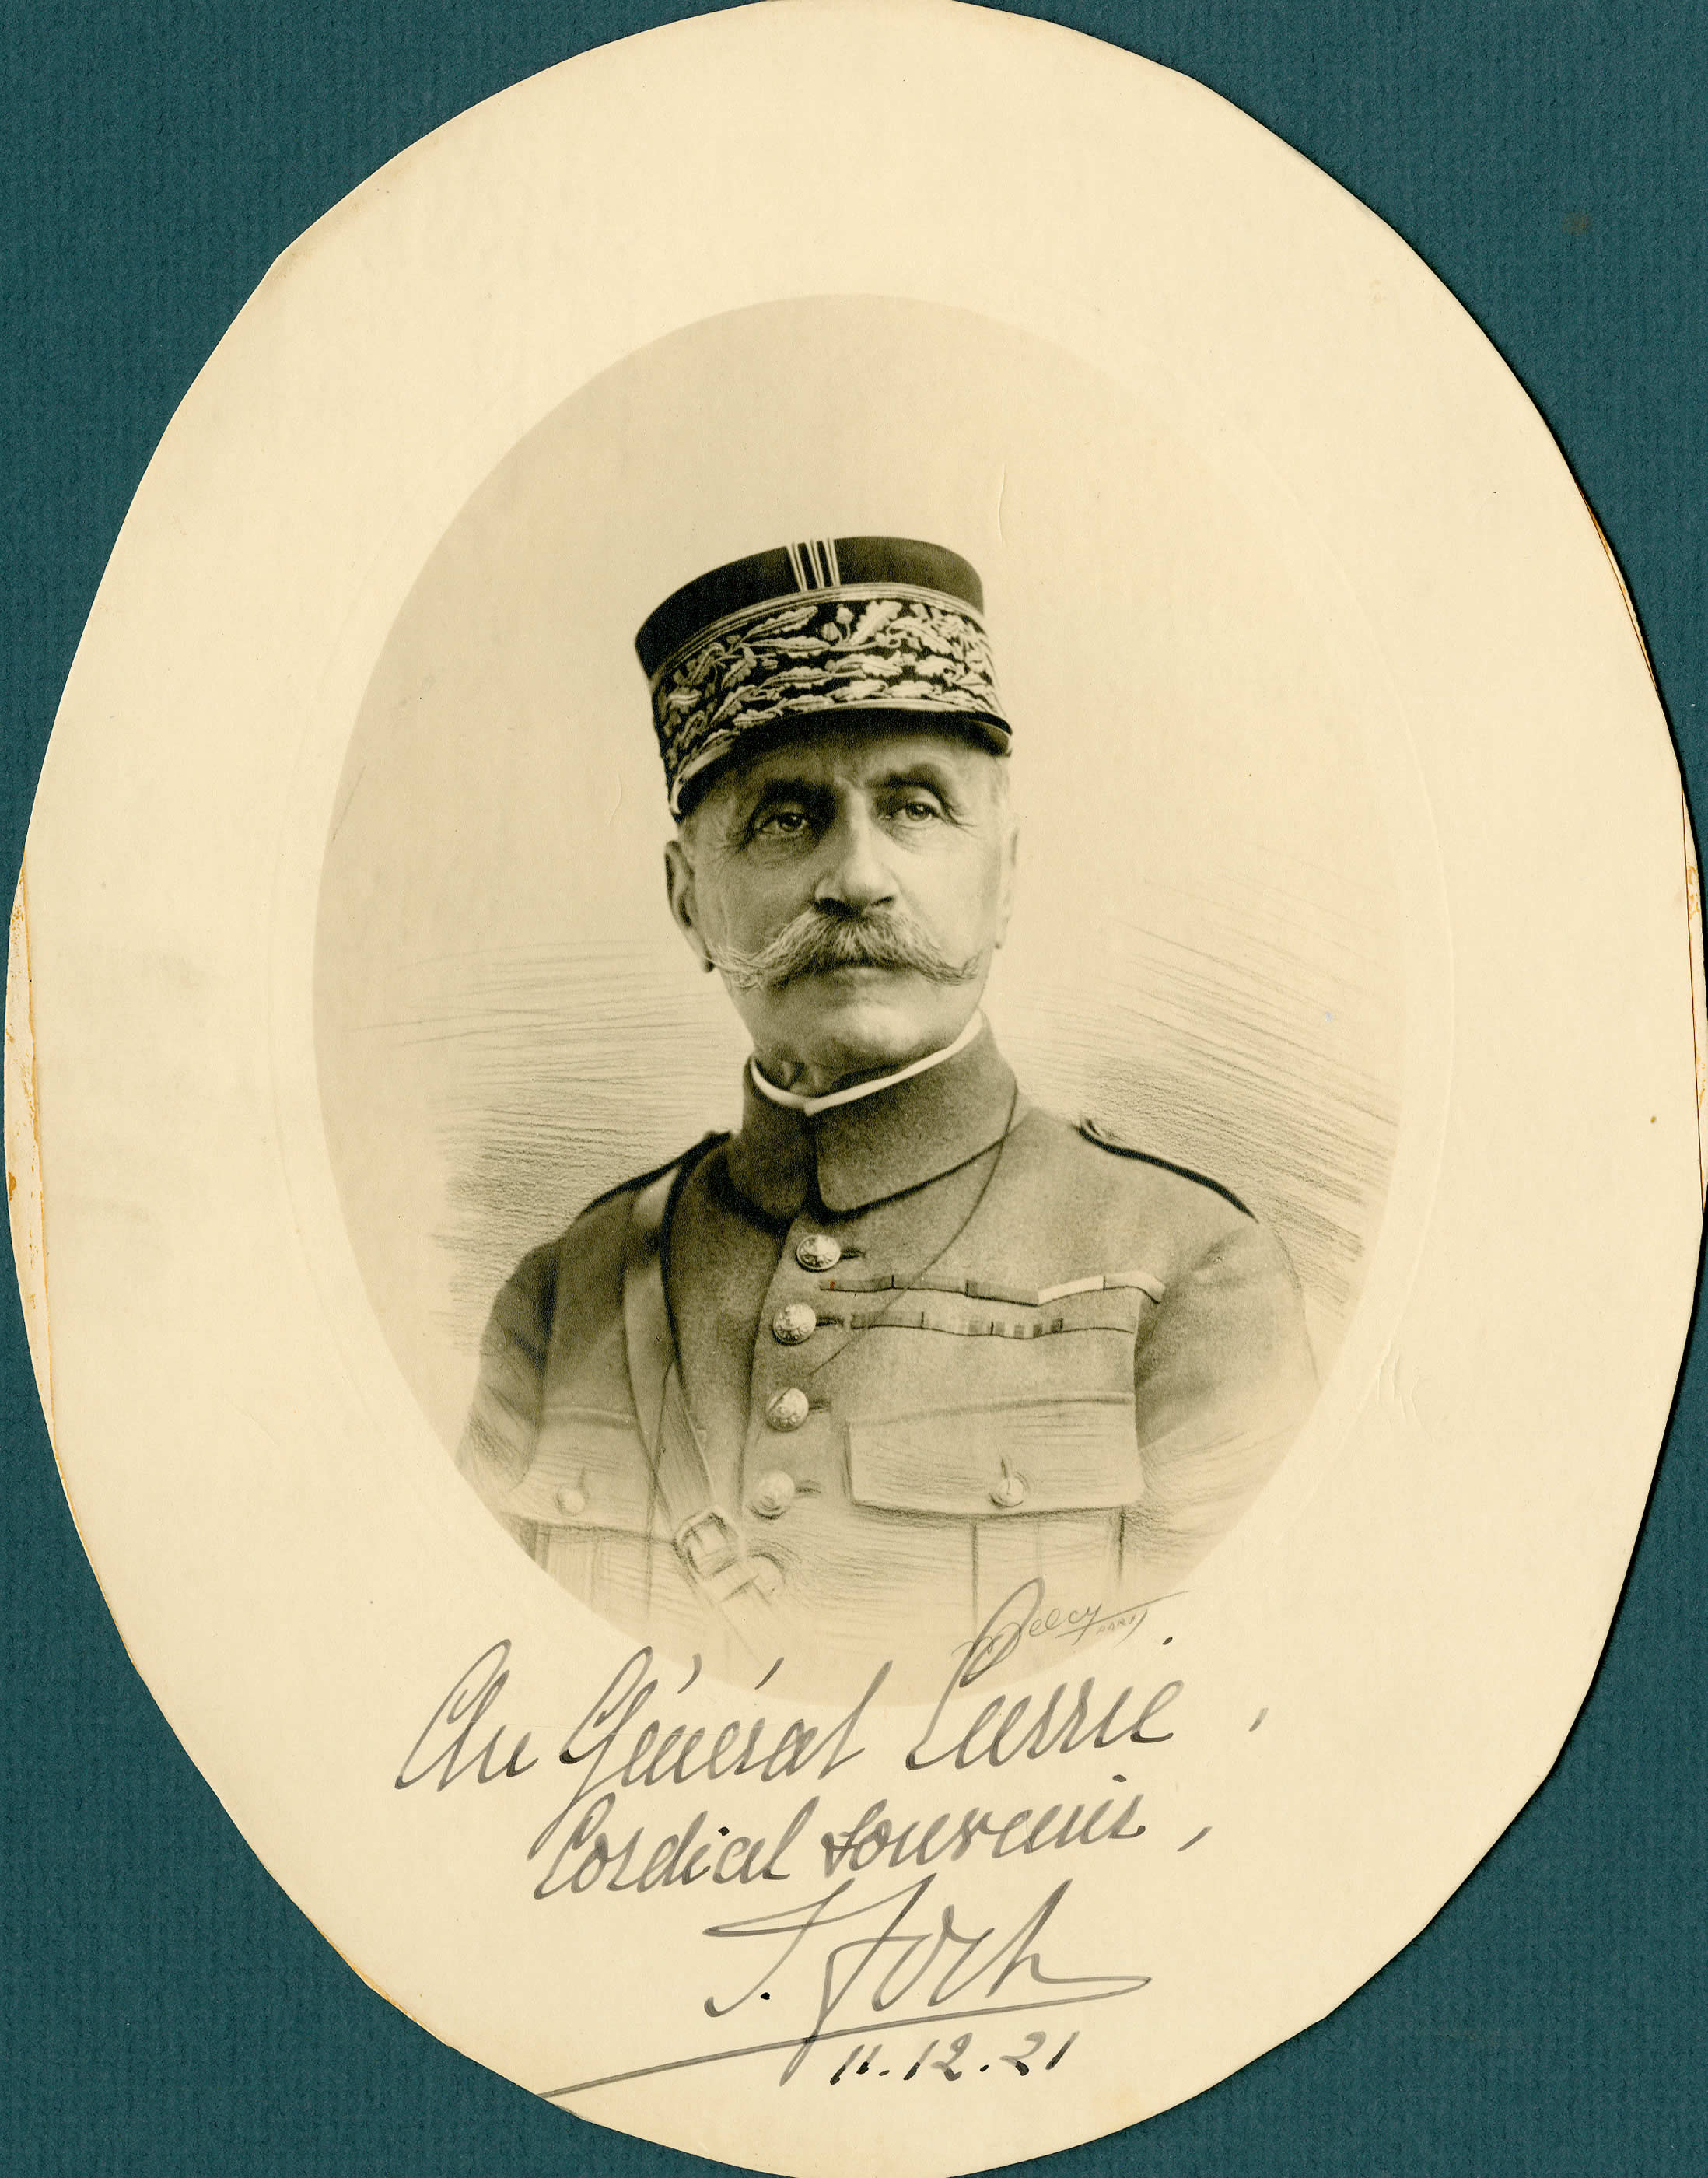 Le maréchal Foch